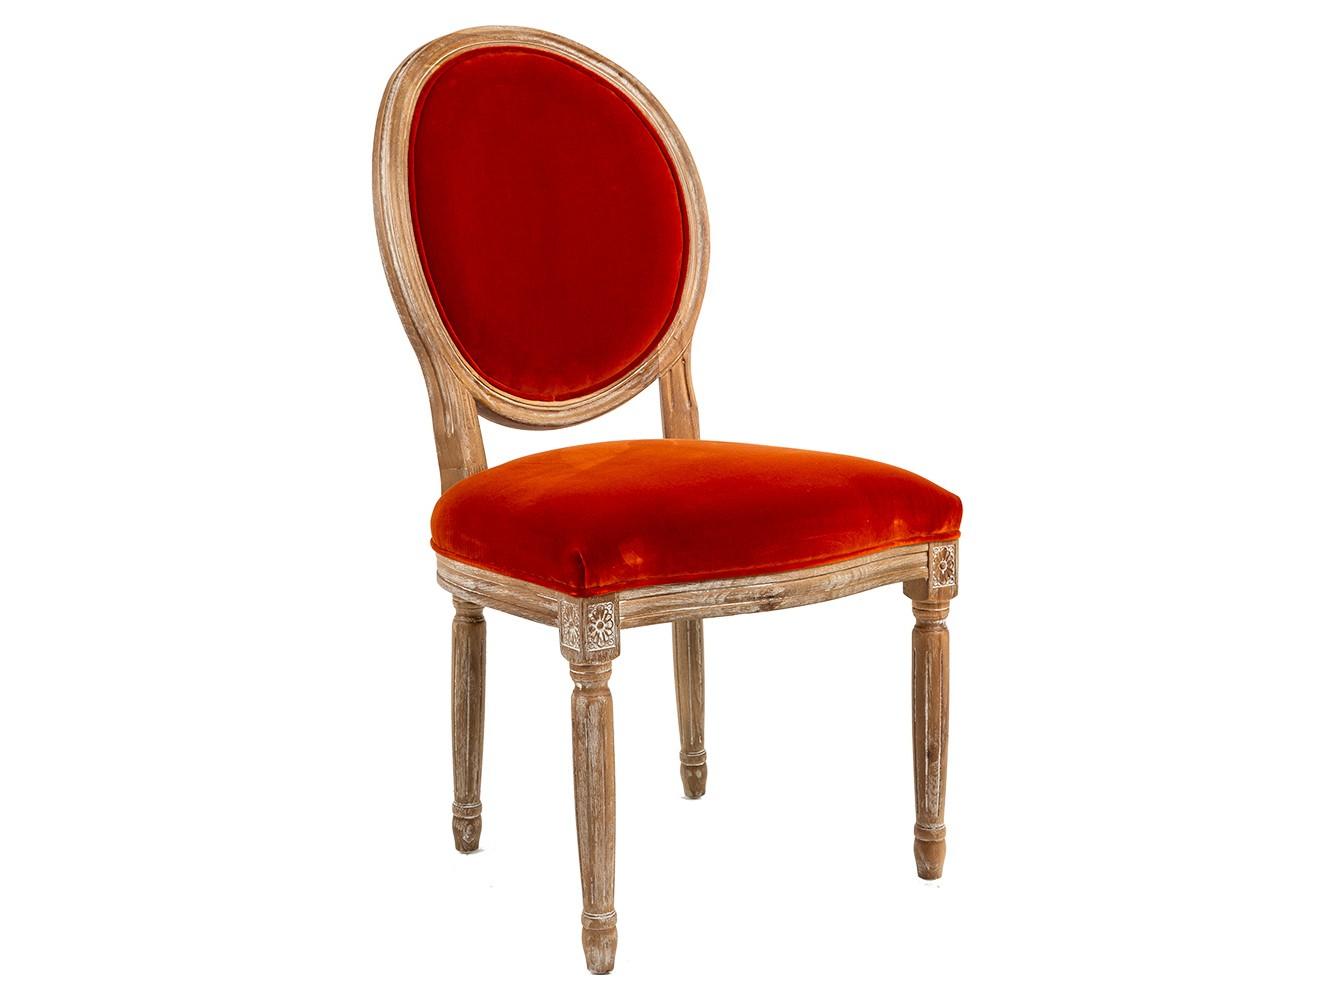 Кухонный стул Object Desire 15438285 от thefurnish